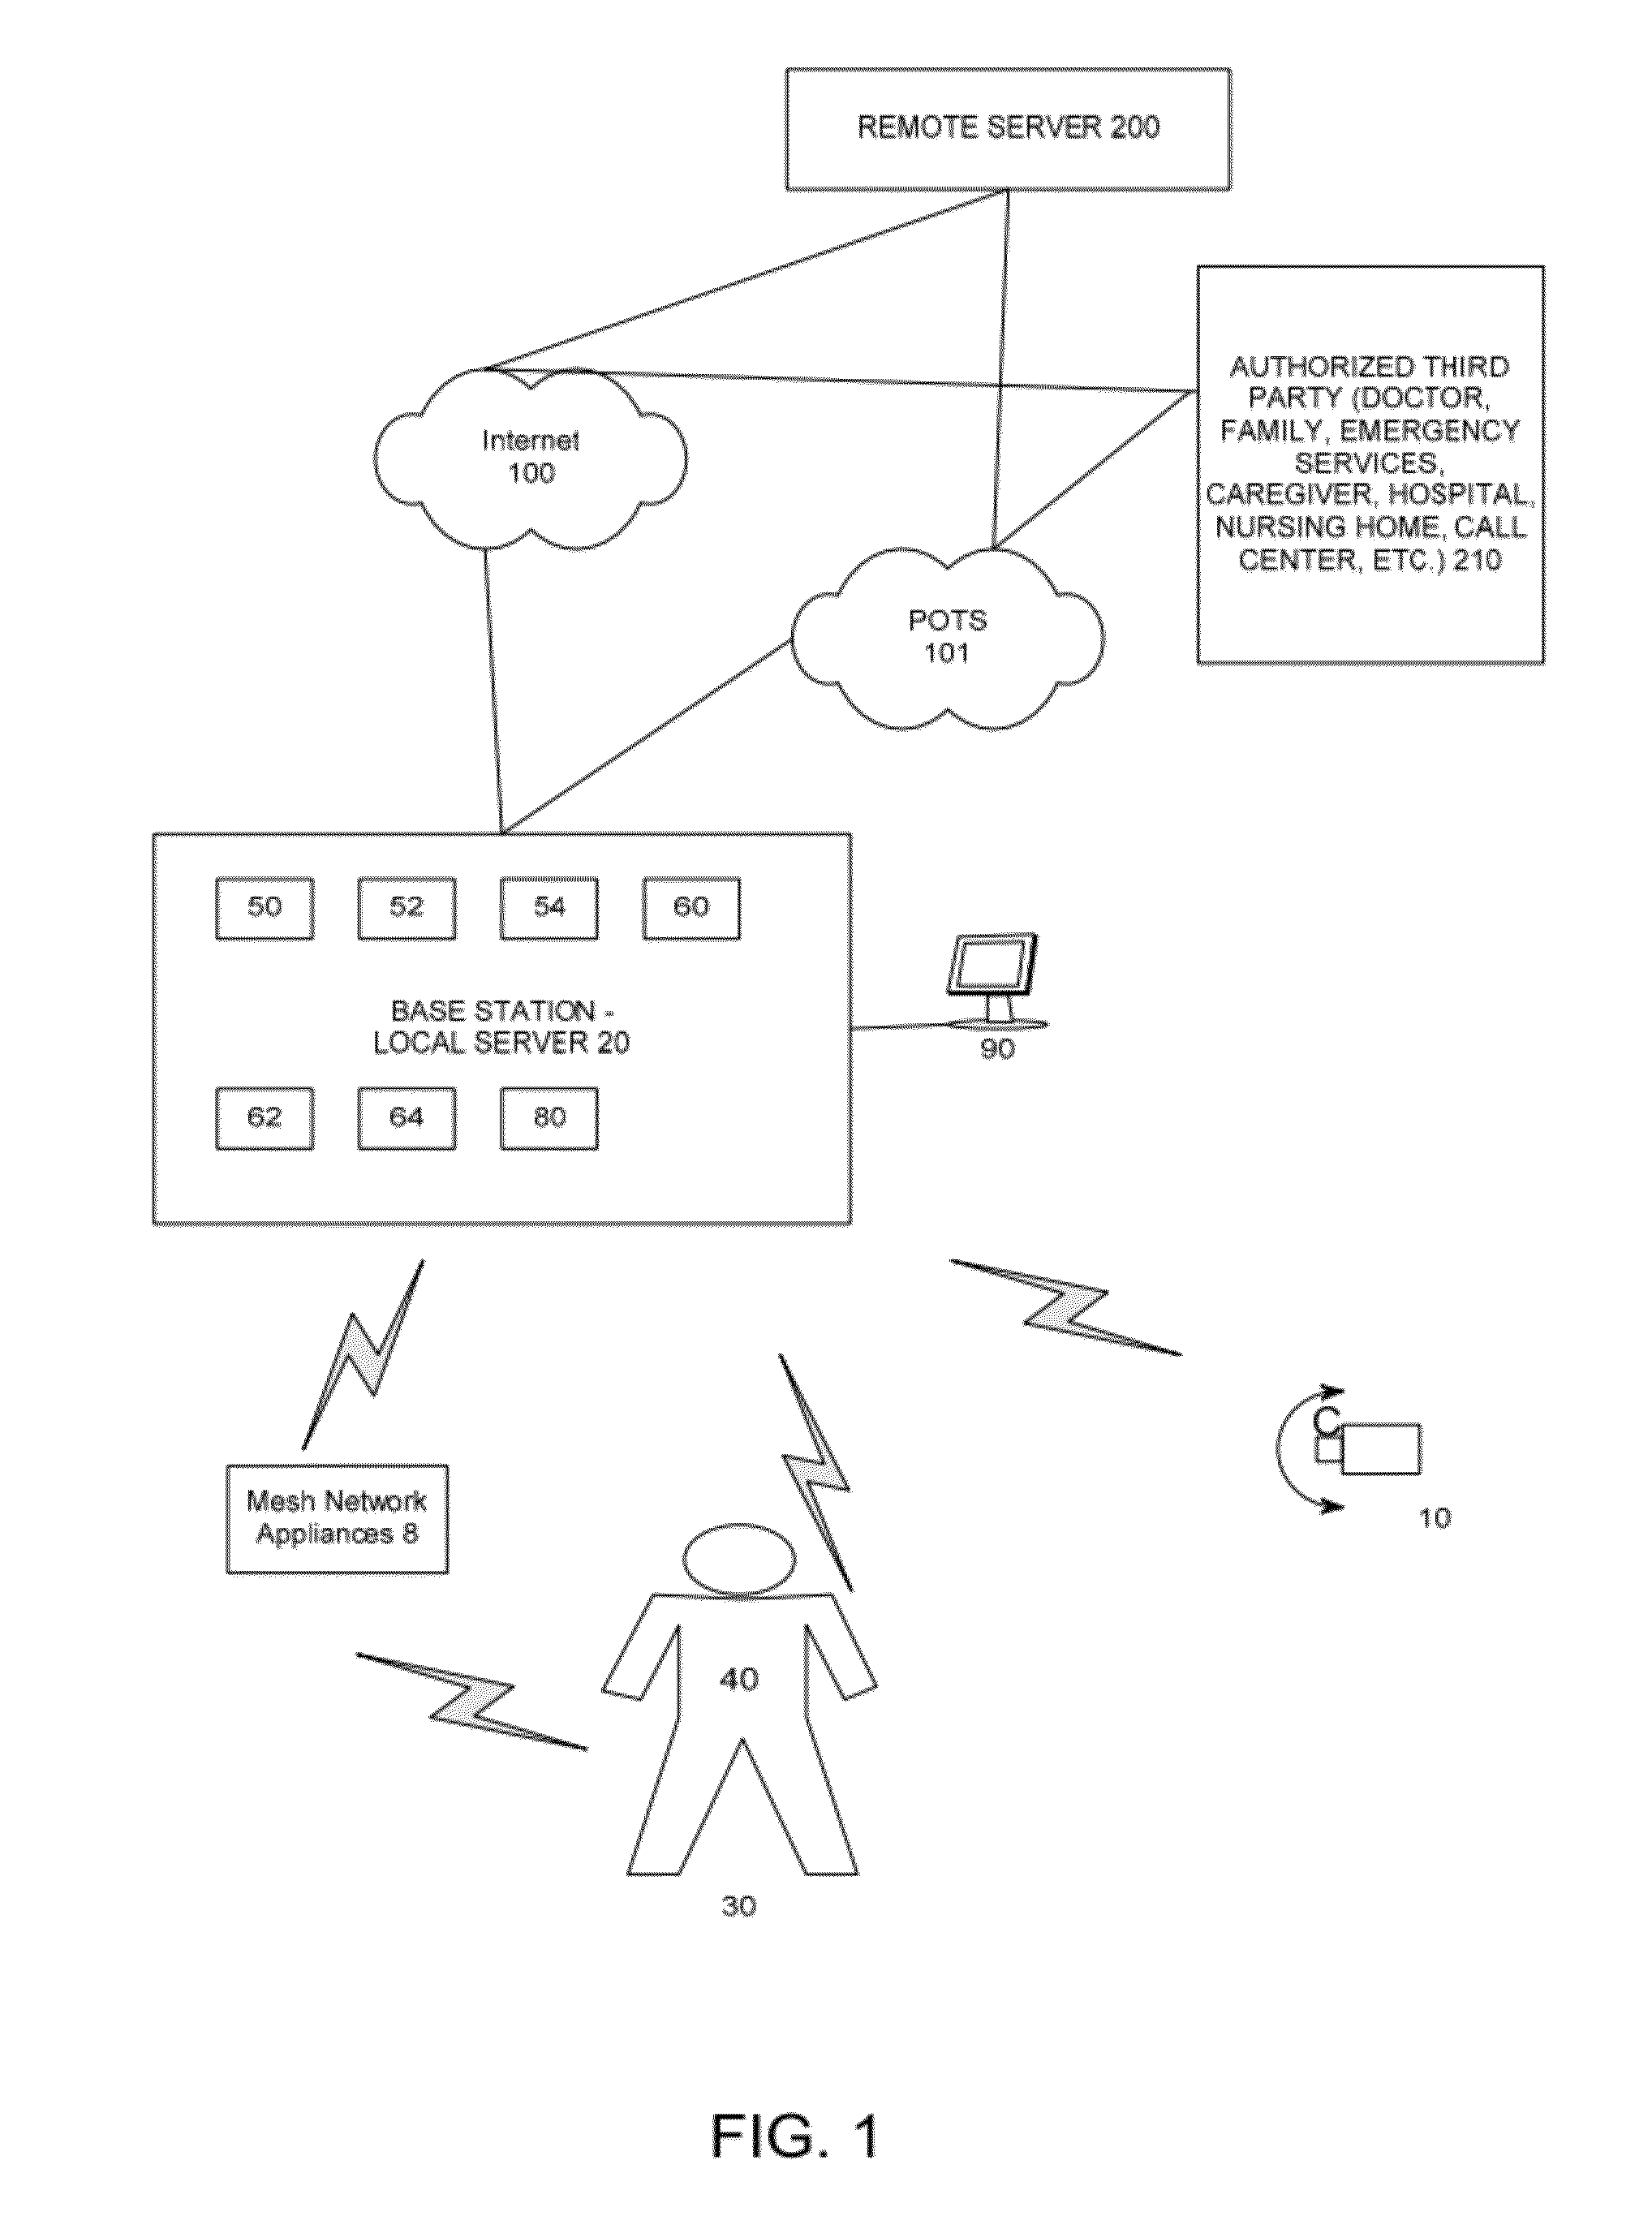 Patent US 8,323,188 B2